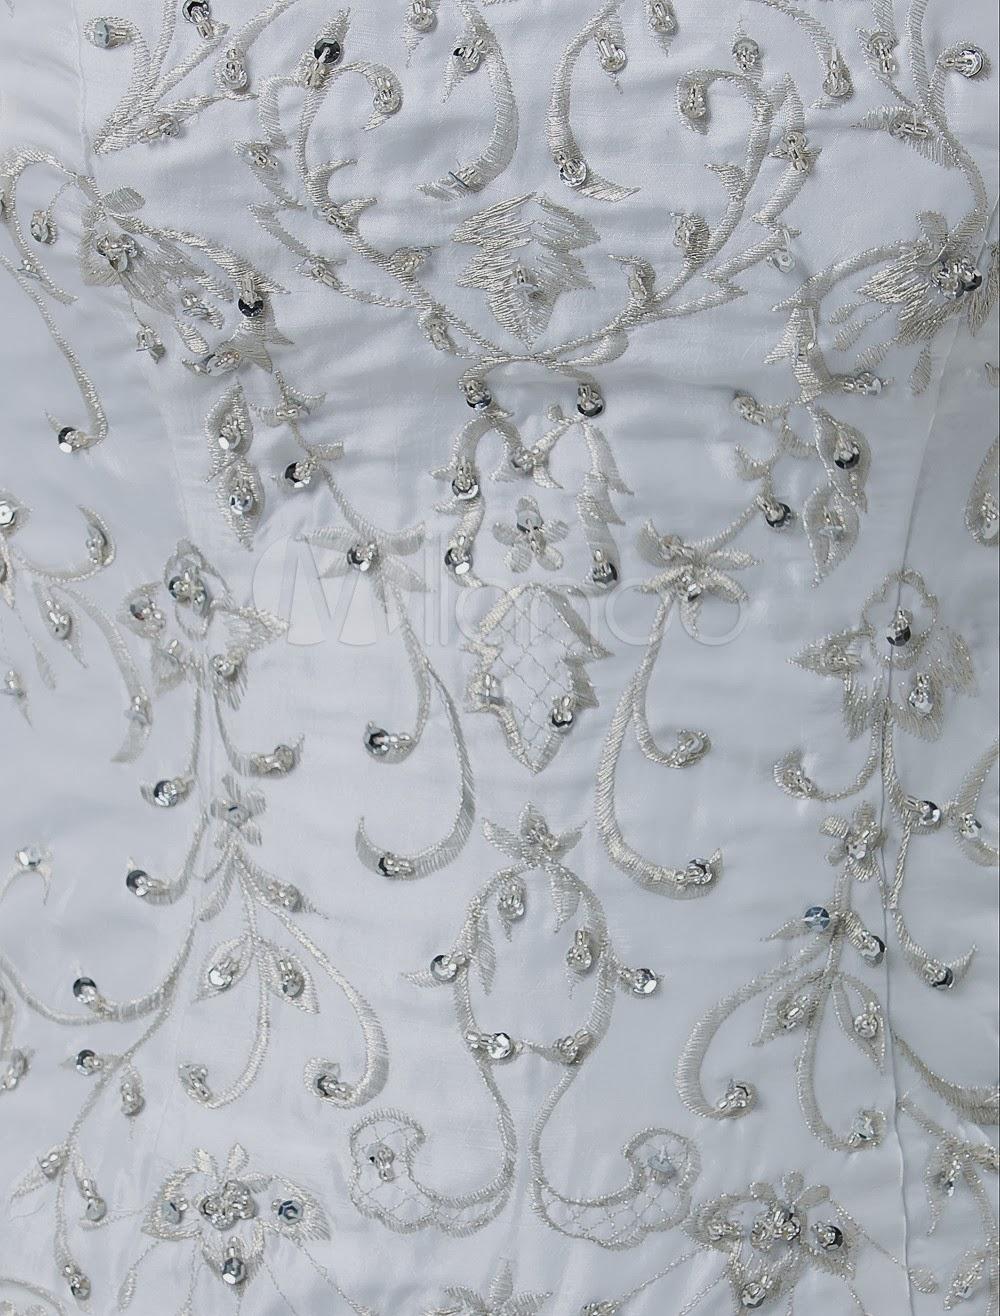 China Wholesale Dresses - Elegant White Ball Gown Strapless Taffeta Pongee Beading Embroidery Wedding Dress